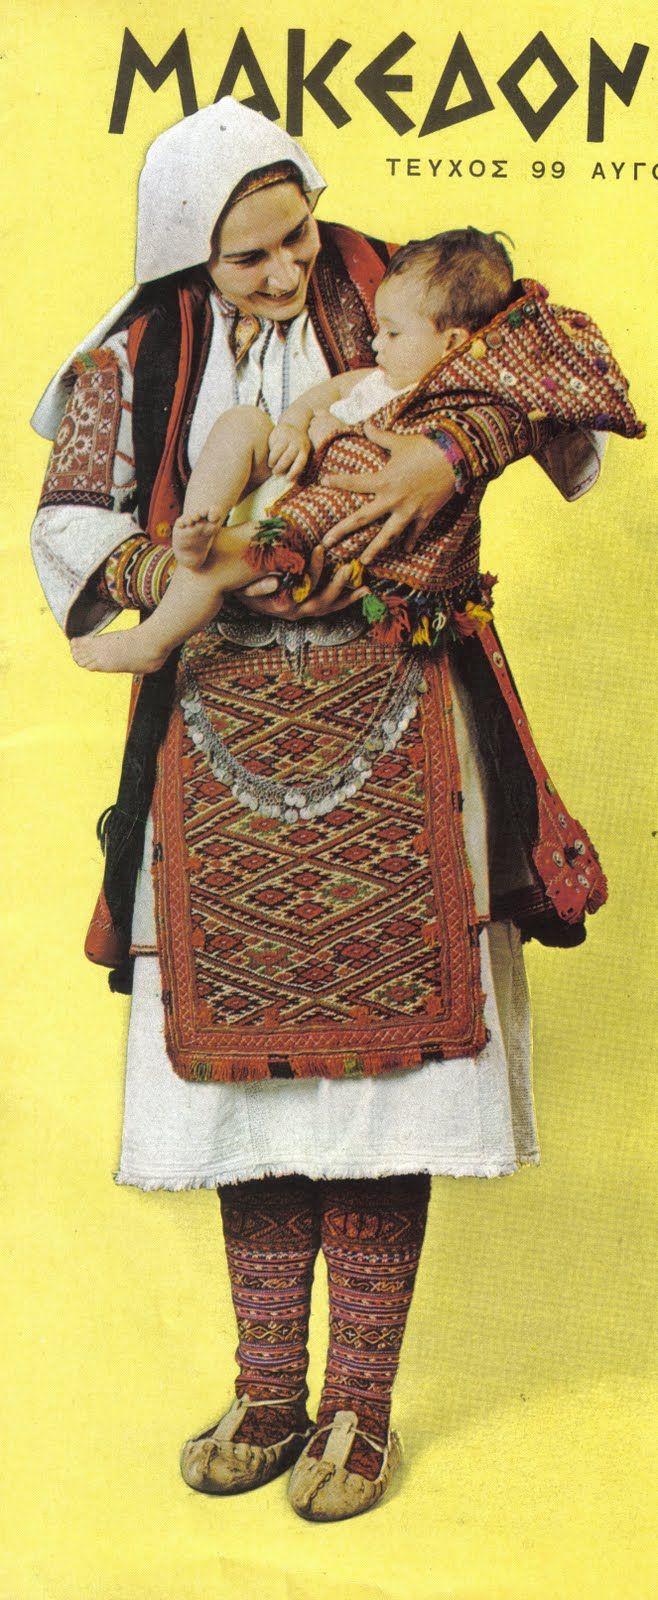 kparlapani: Η παραδοσιακή φορεσιά του Ανταρτικού (Ζελόβου) Φλώρινας